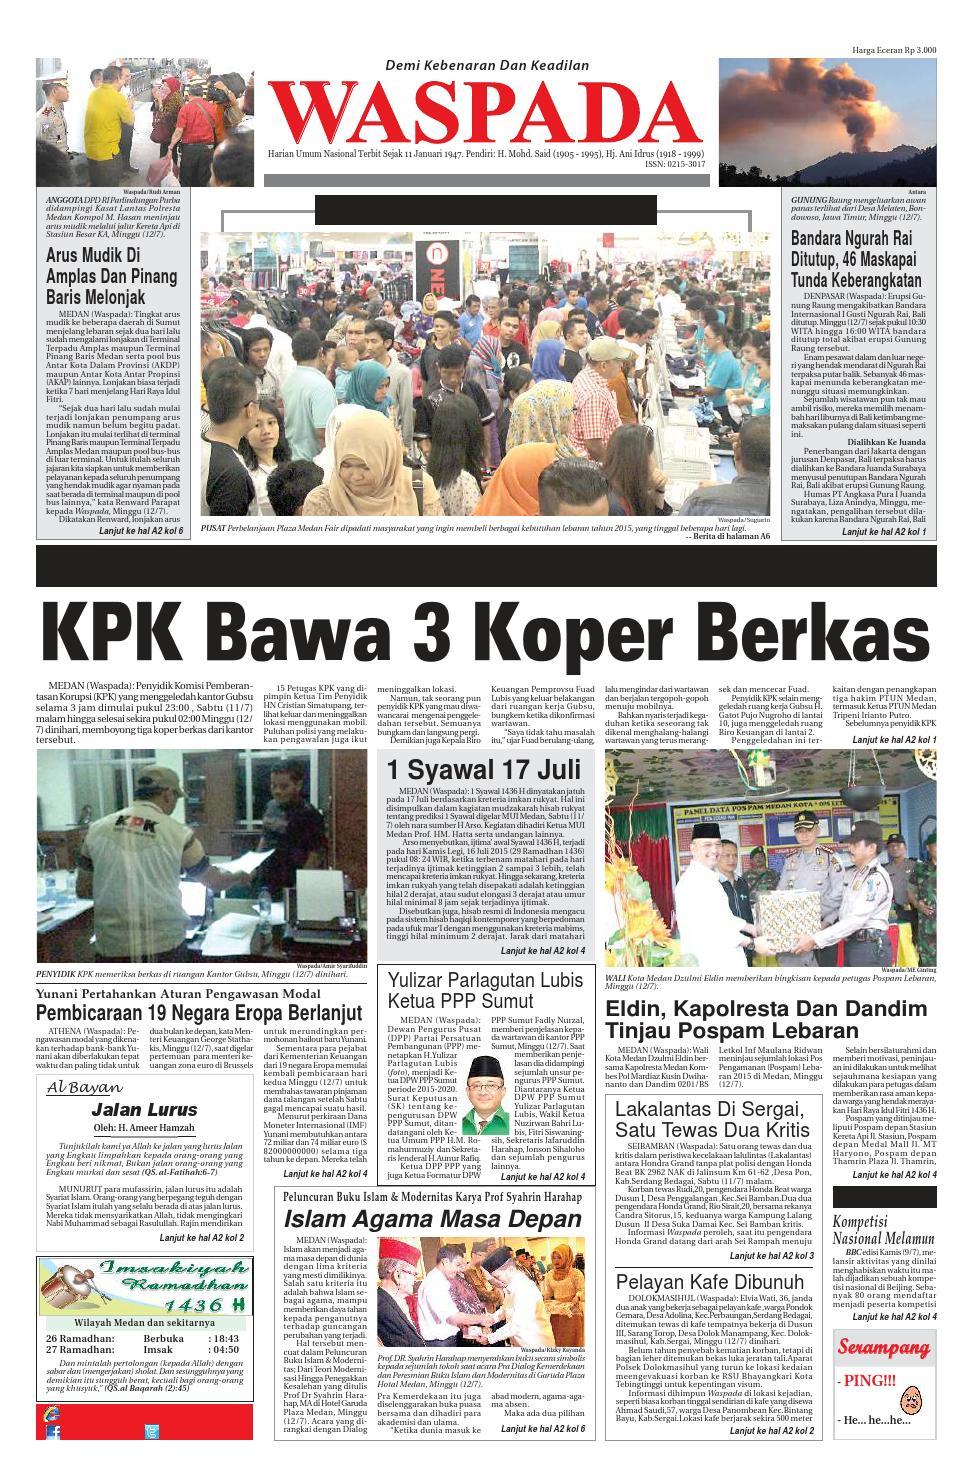 Waspada Senin 13 Juli 2015 By Harian Issuu Produk Ukm Bumn Batik Lengan Panjang Parang Toko Ngremboko